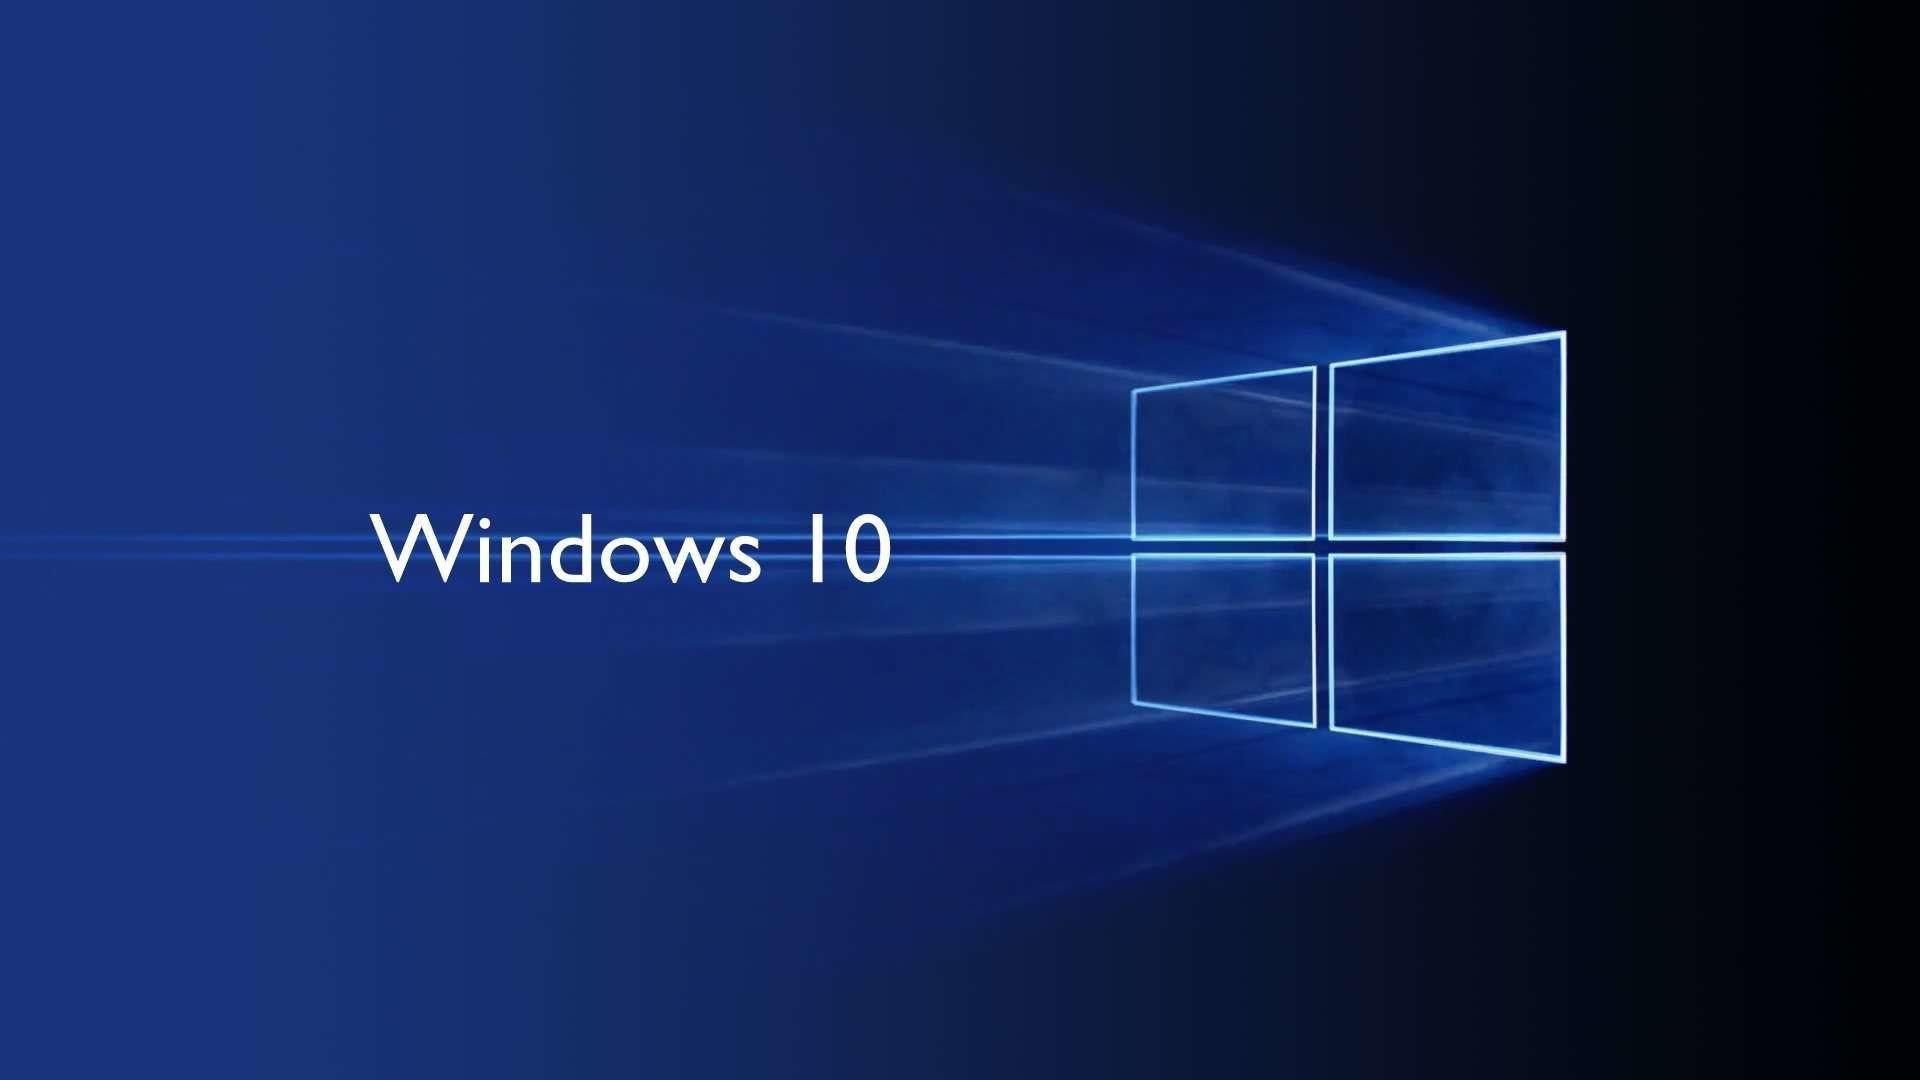 Wallpaper: Windows 10 Hd Desktop 1080p. Upload at August 1, 2015 by .